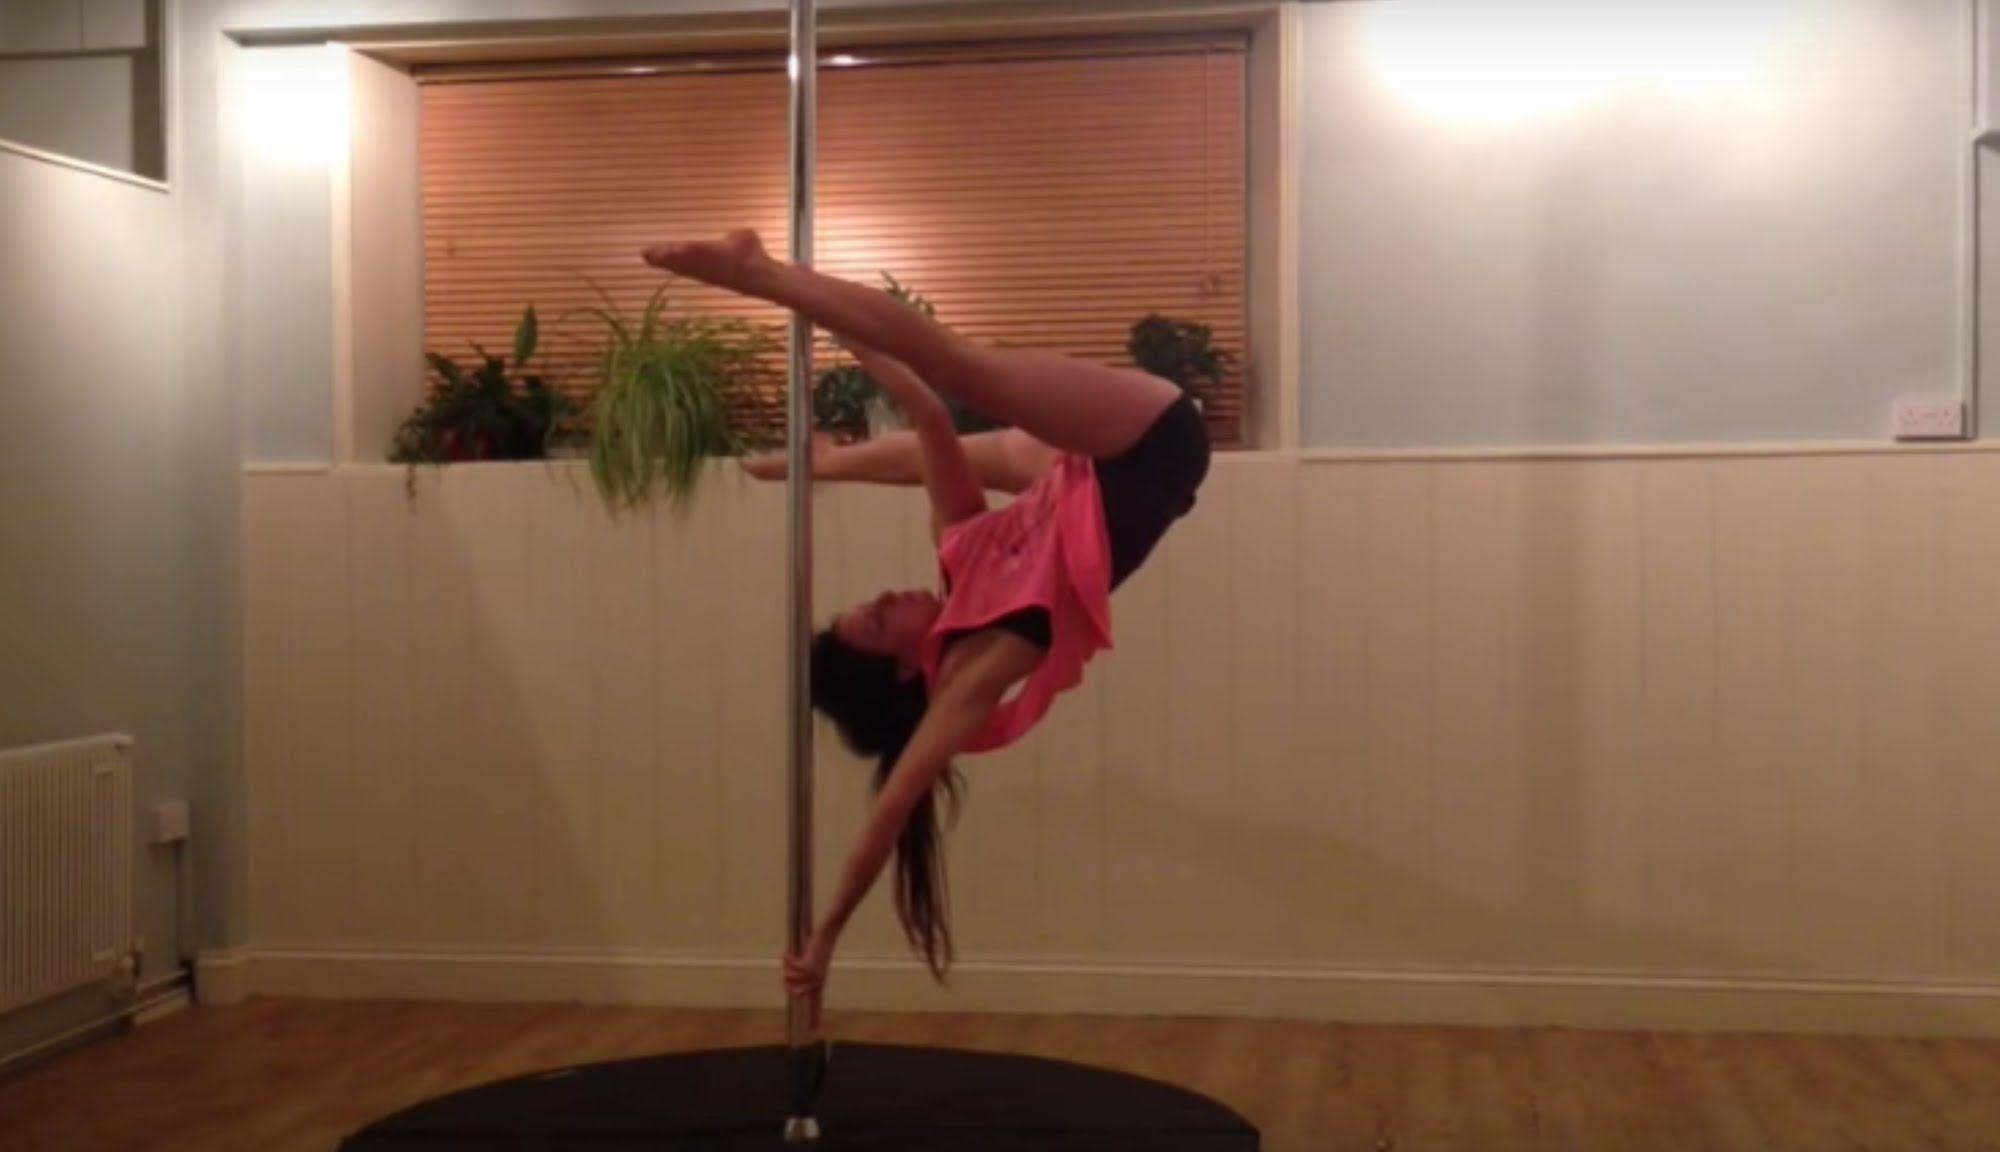 Park Art My WordPress Blog_Beginner Pole Dancing Lessons Near Me